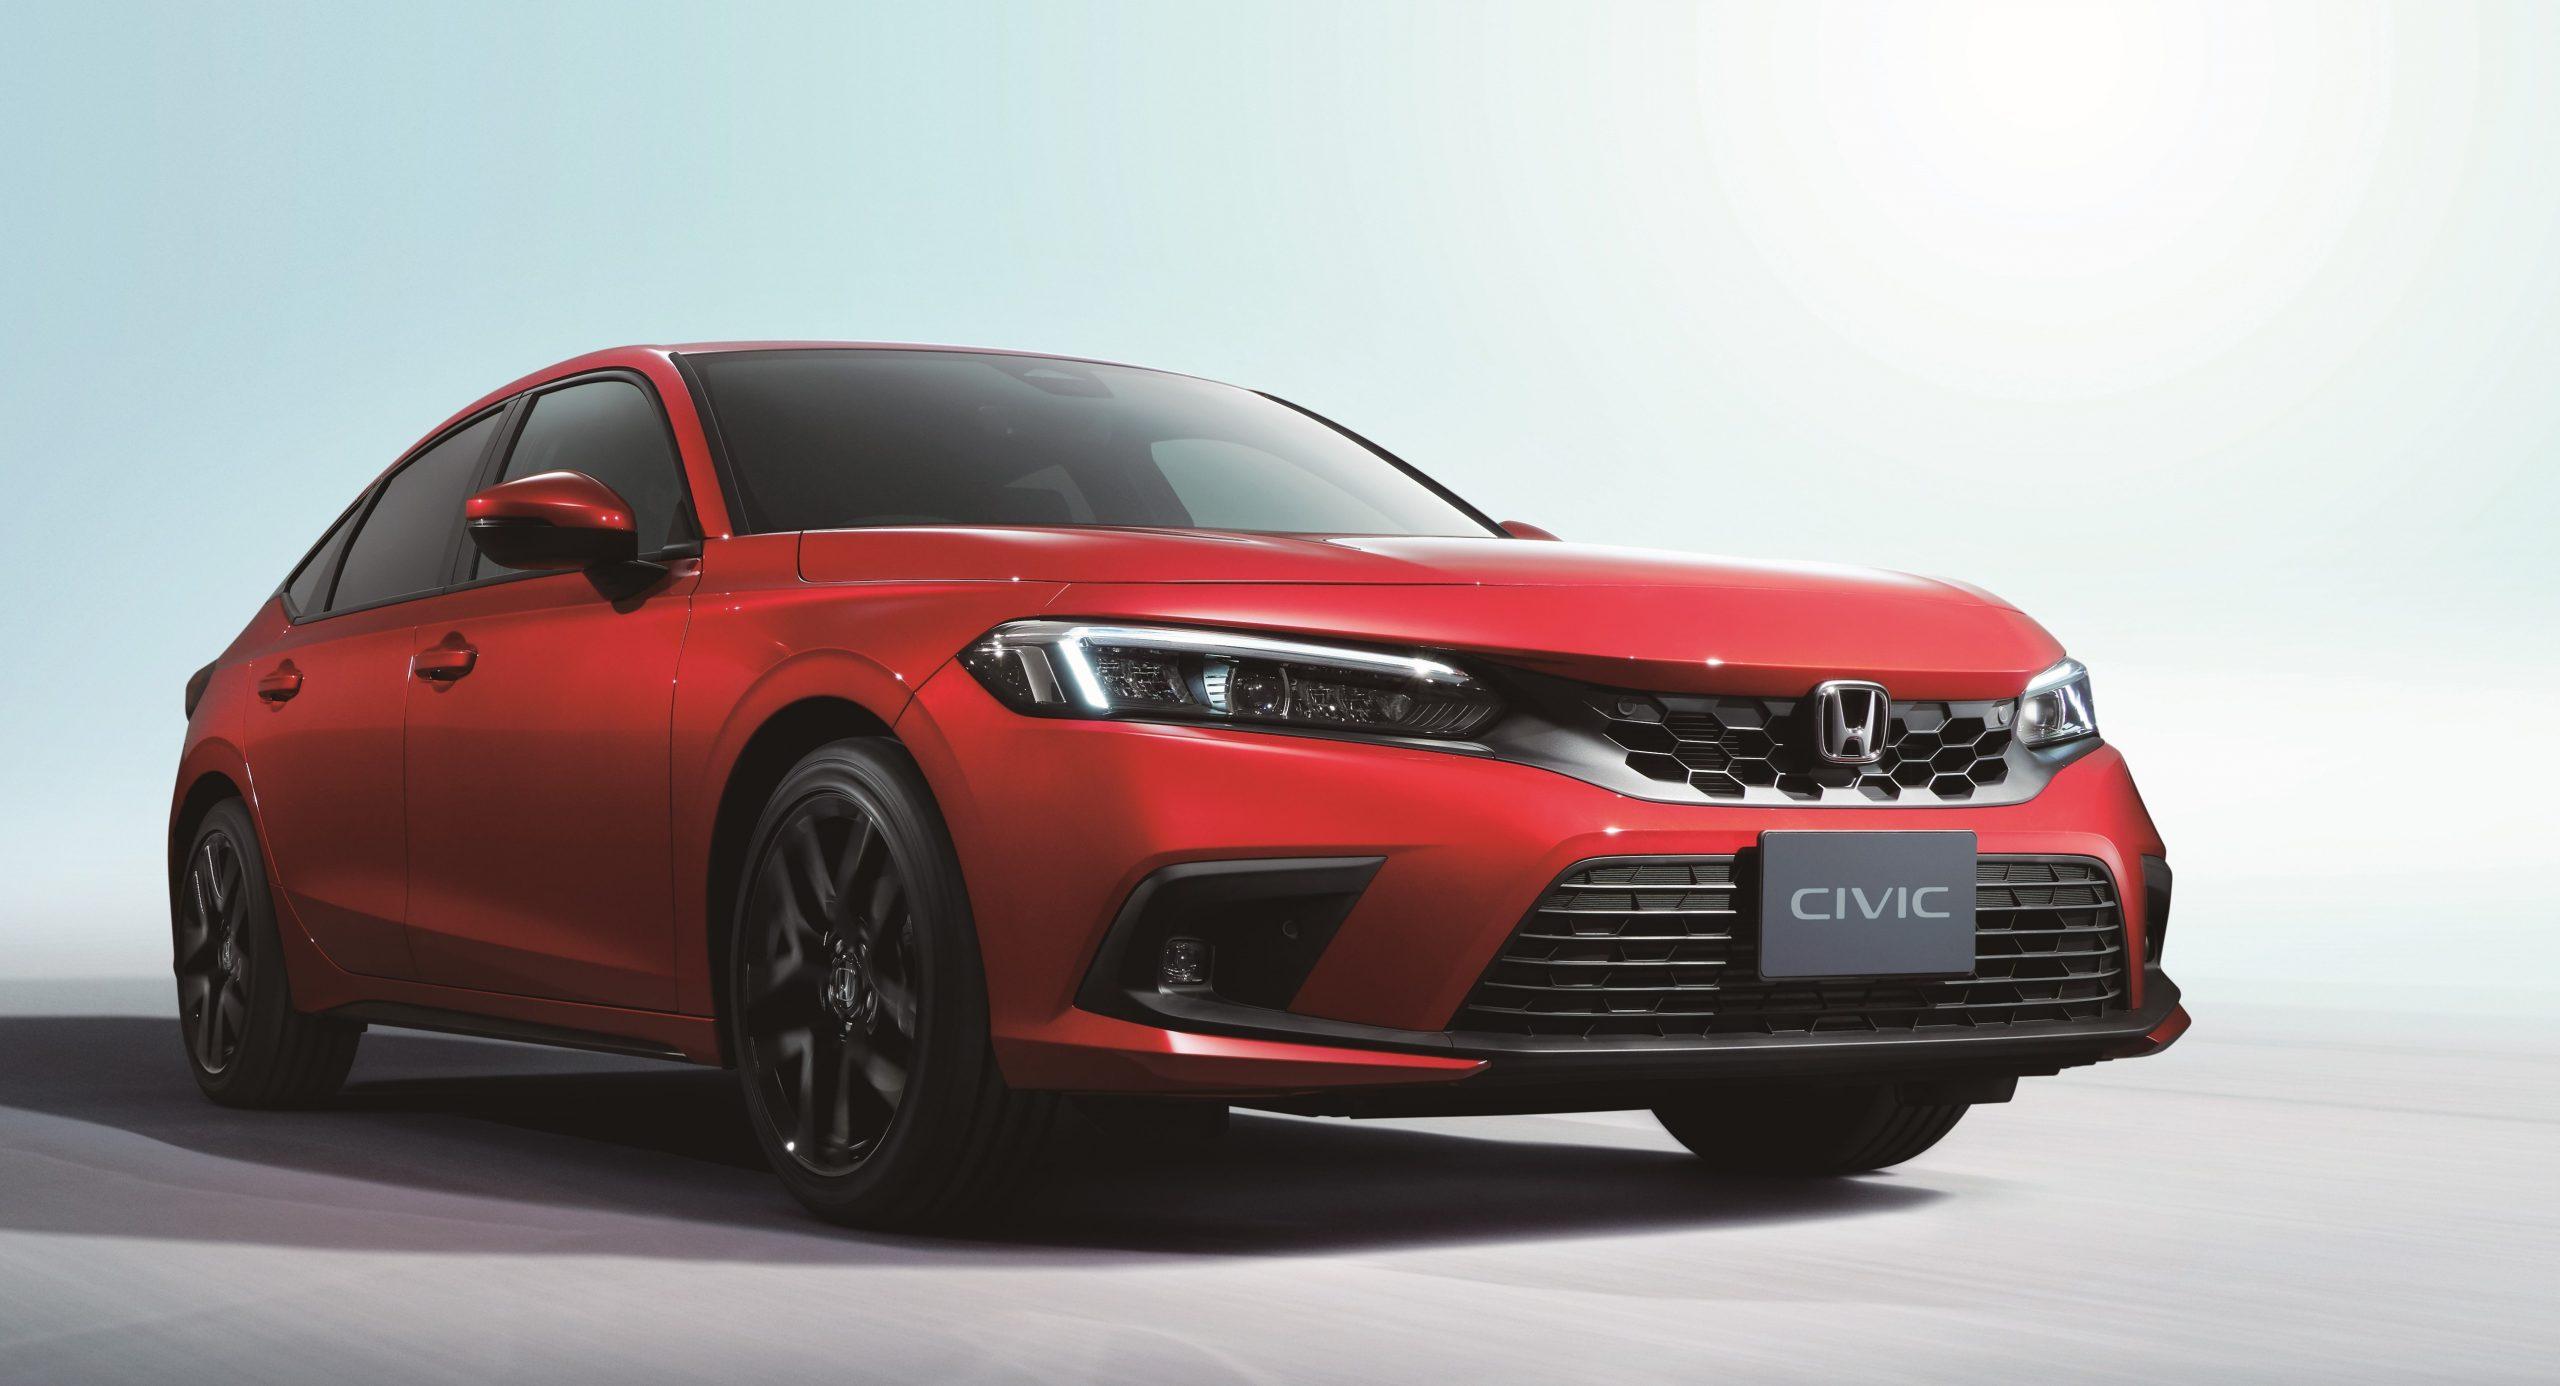 336505 All New Civic e HEV scaled Αυτό είναι το νέο Civic Honda, Honda Civic, ειδήσεις, Νέα